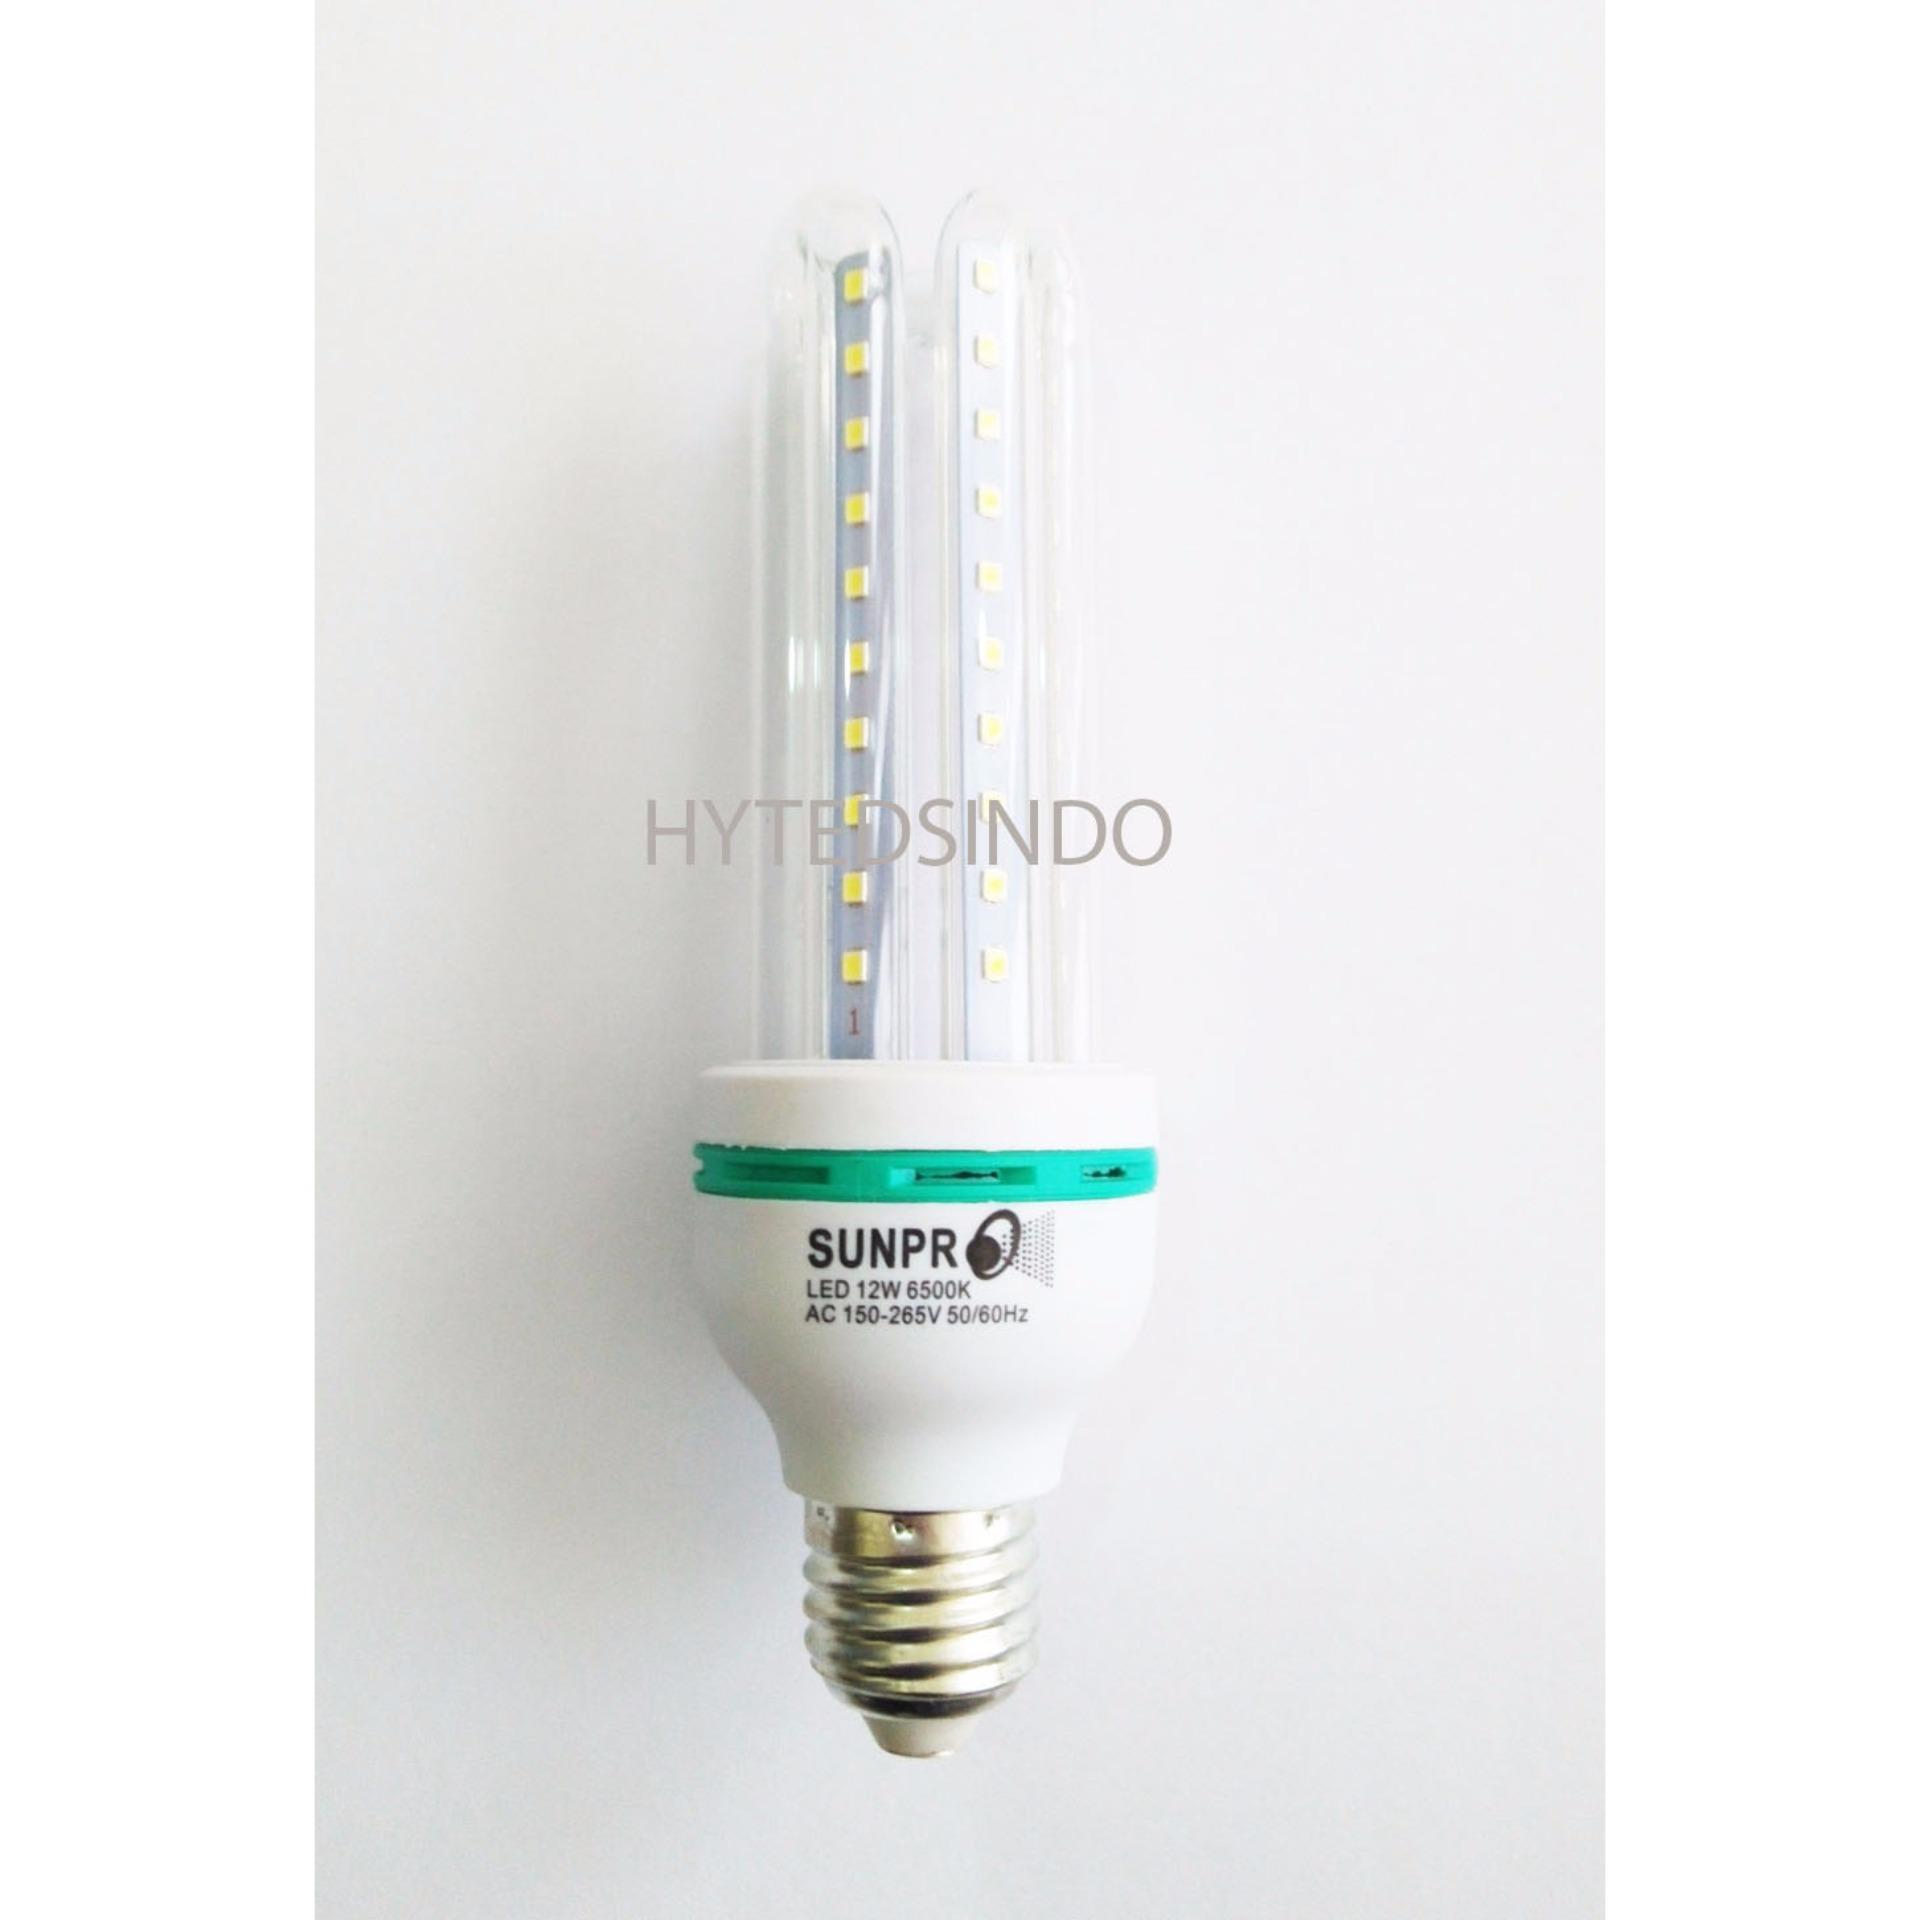 Price Checker Lampu Led Hemat energi 12 watt Sunpro pencari harga - Hanya Rp20.093